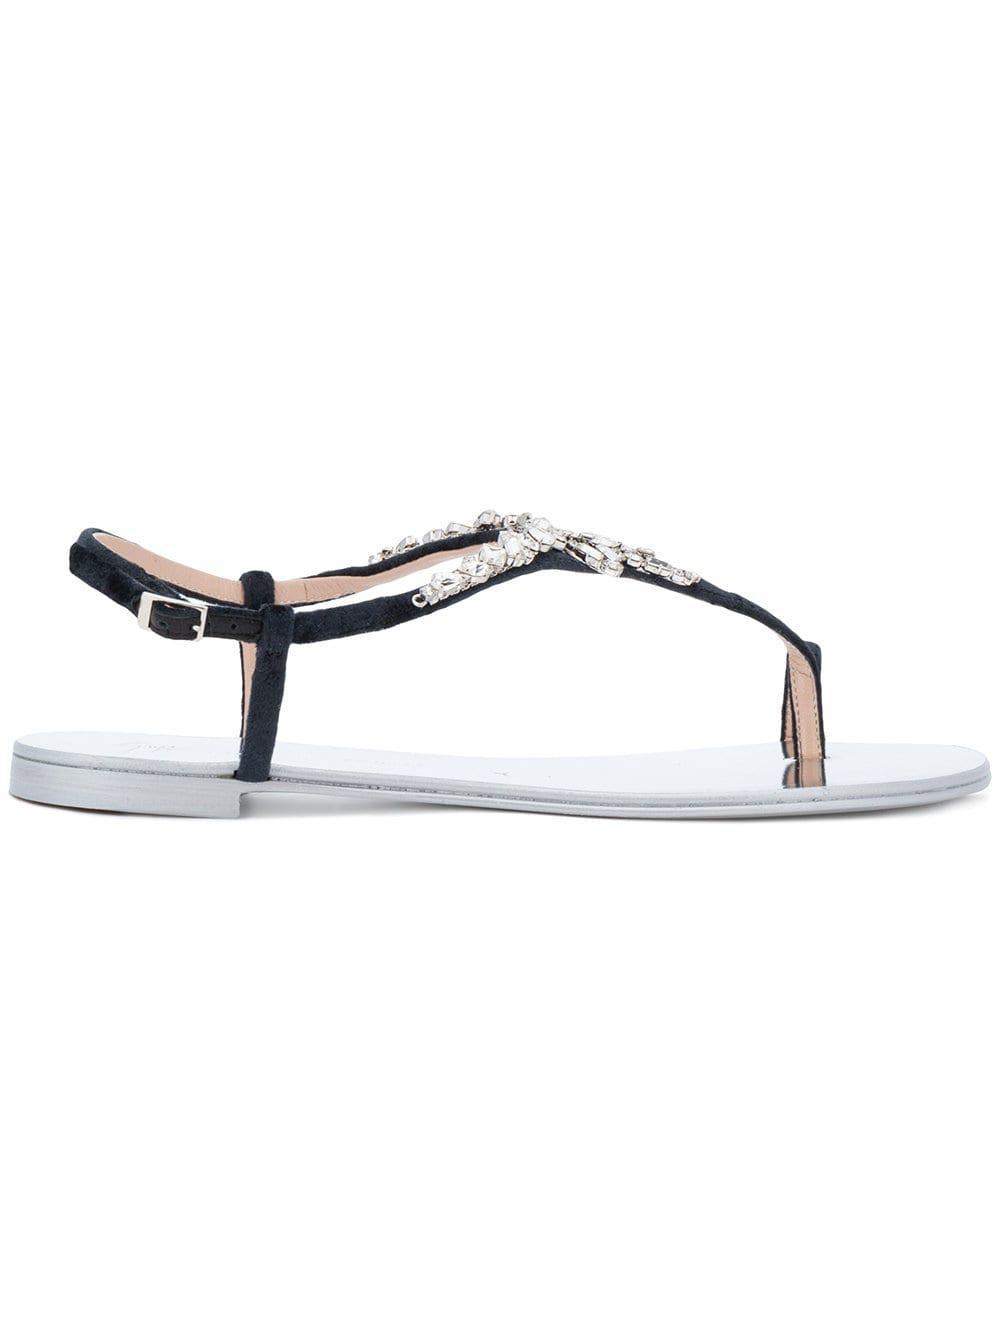 cad2c6a82127 Giuseppe Zanotti Crystal Embellished Flat Sandals in Black - Lyst